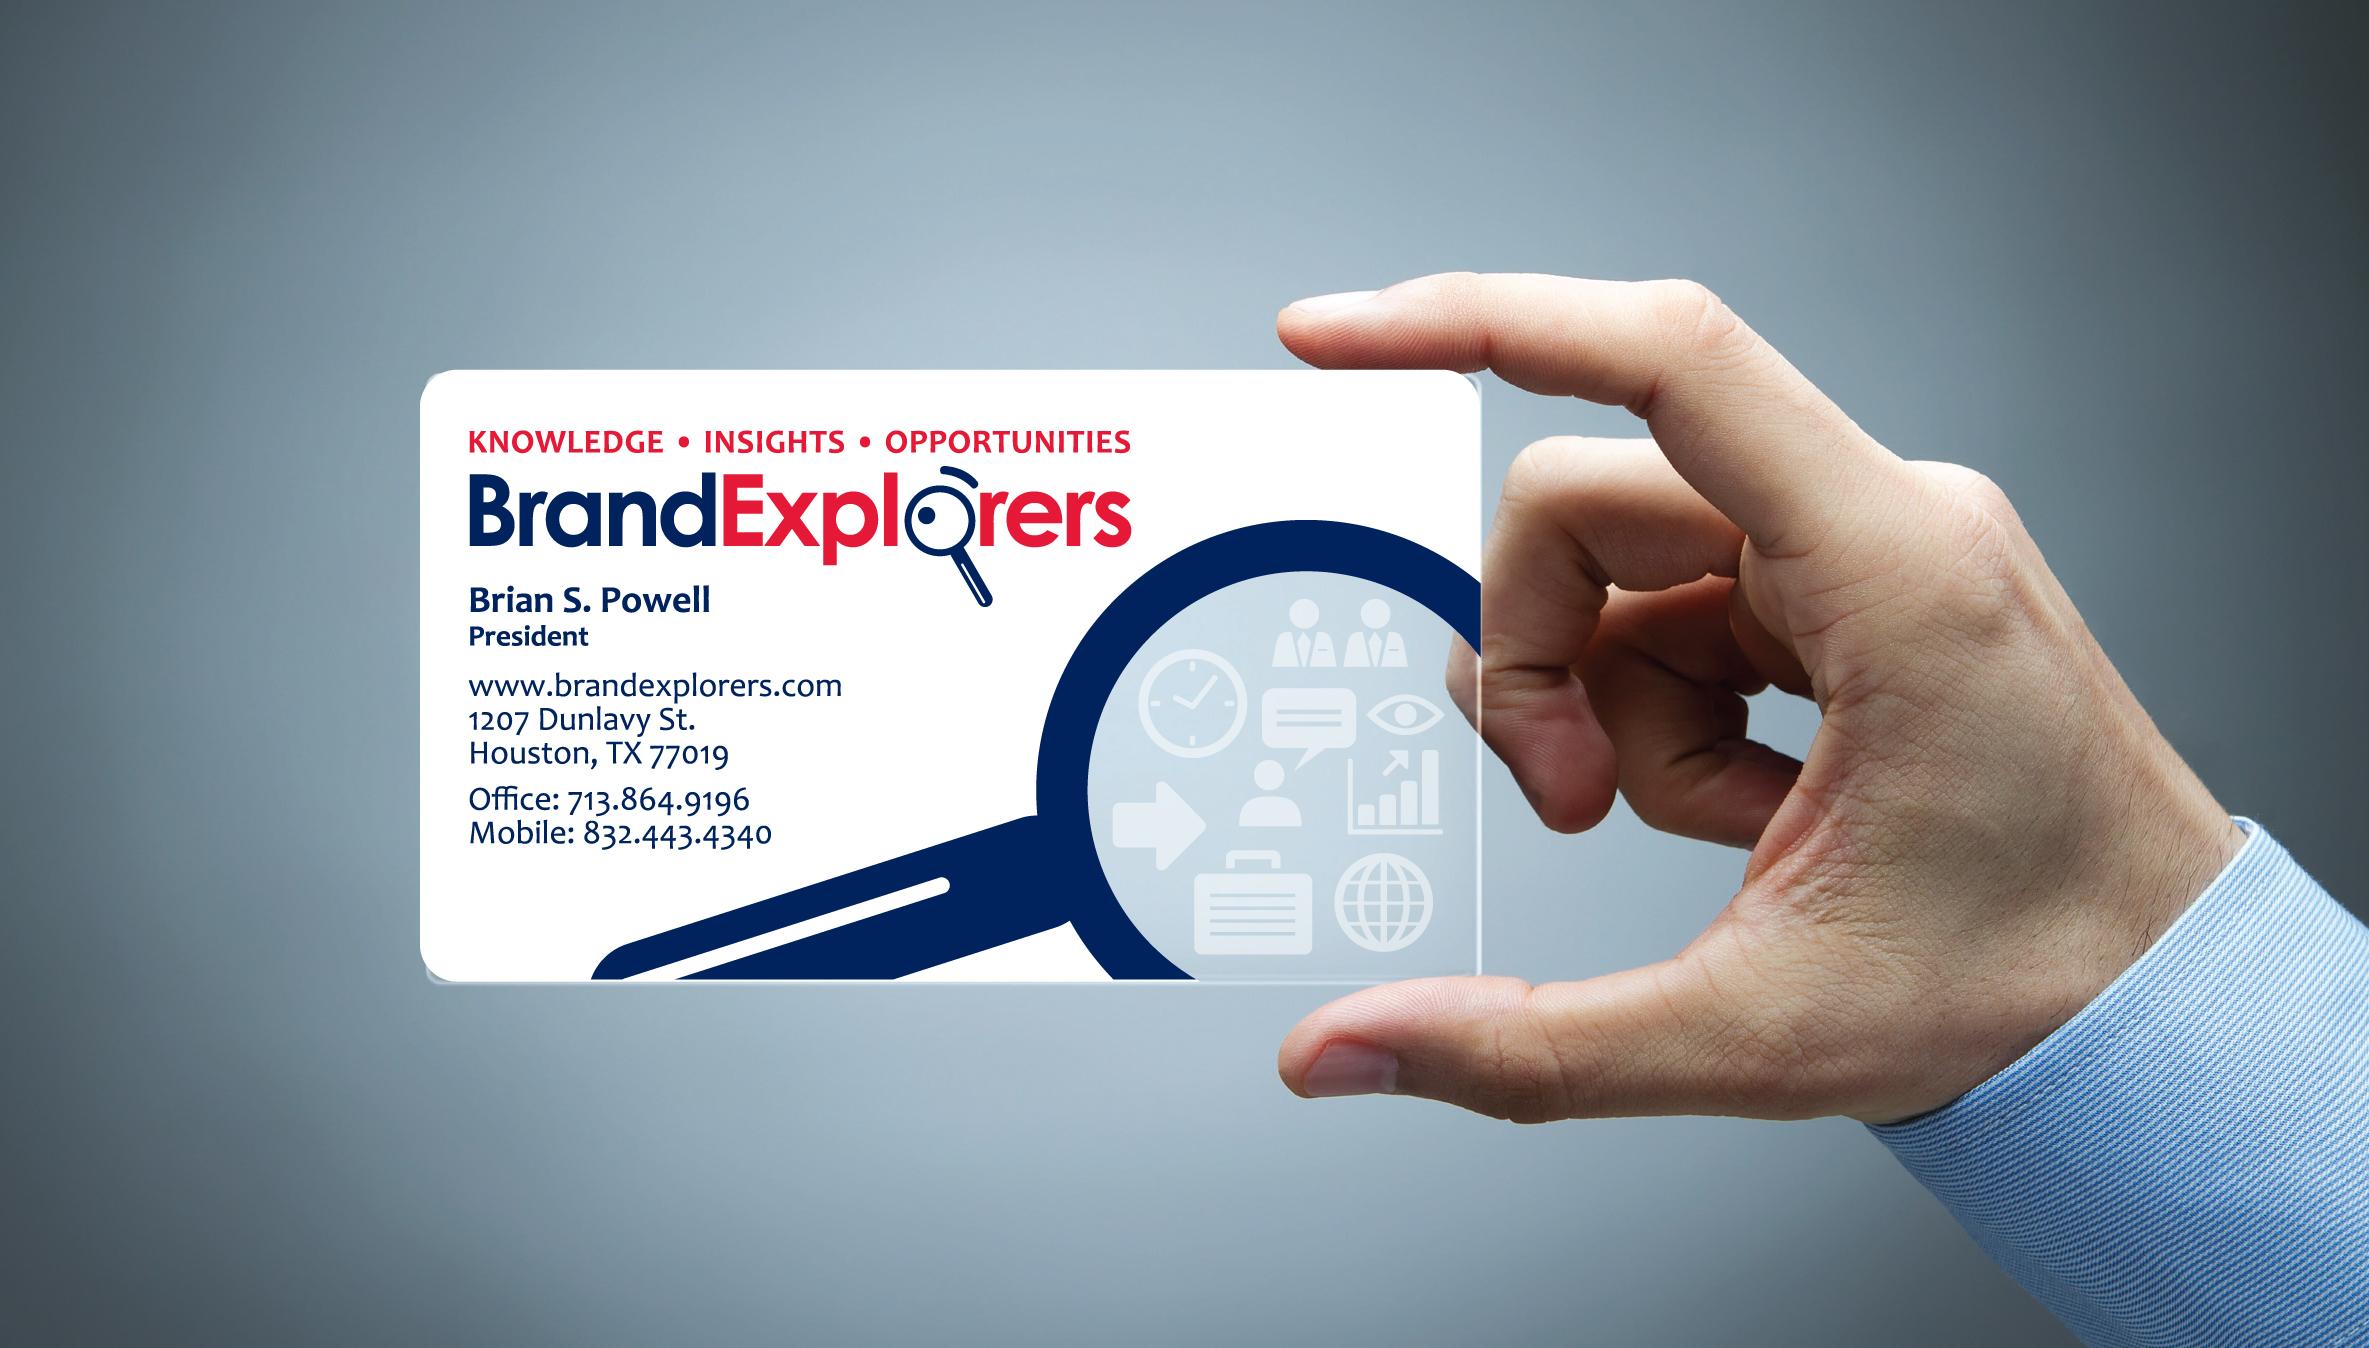 Brand Explorers business card.jpg